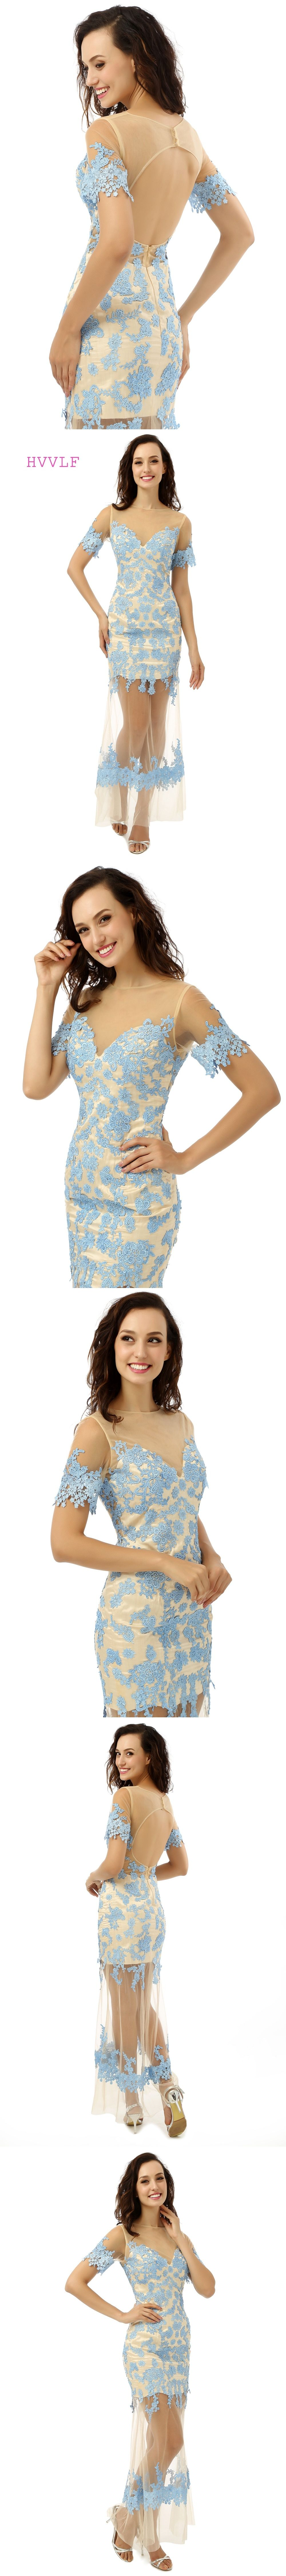 Hvvlf see through prom dresses mermaid high collar sky blue